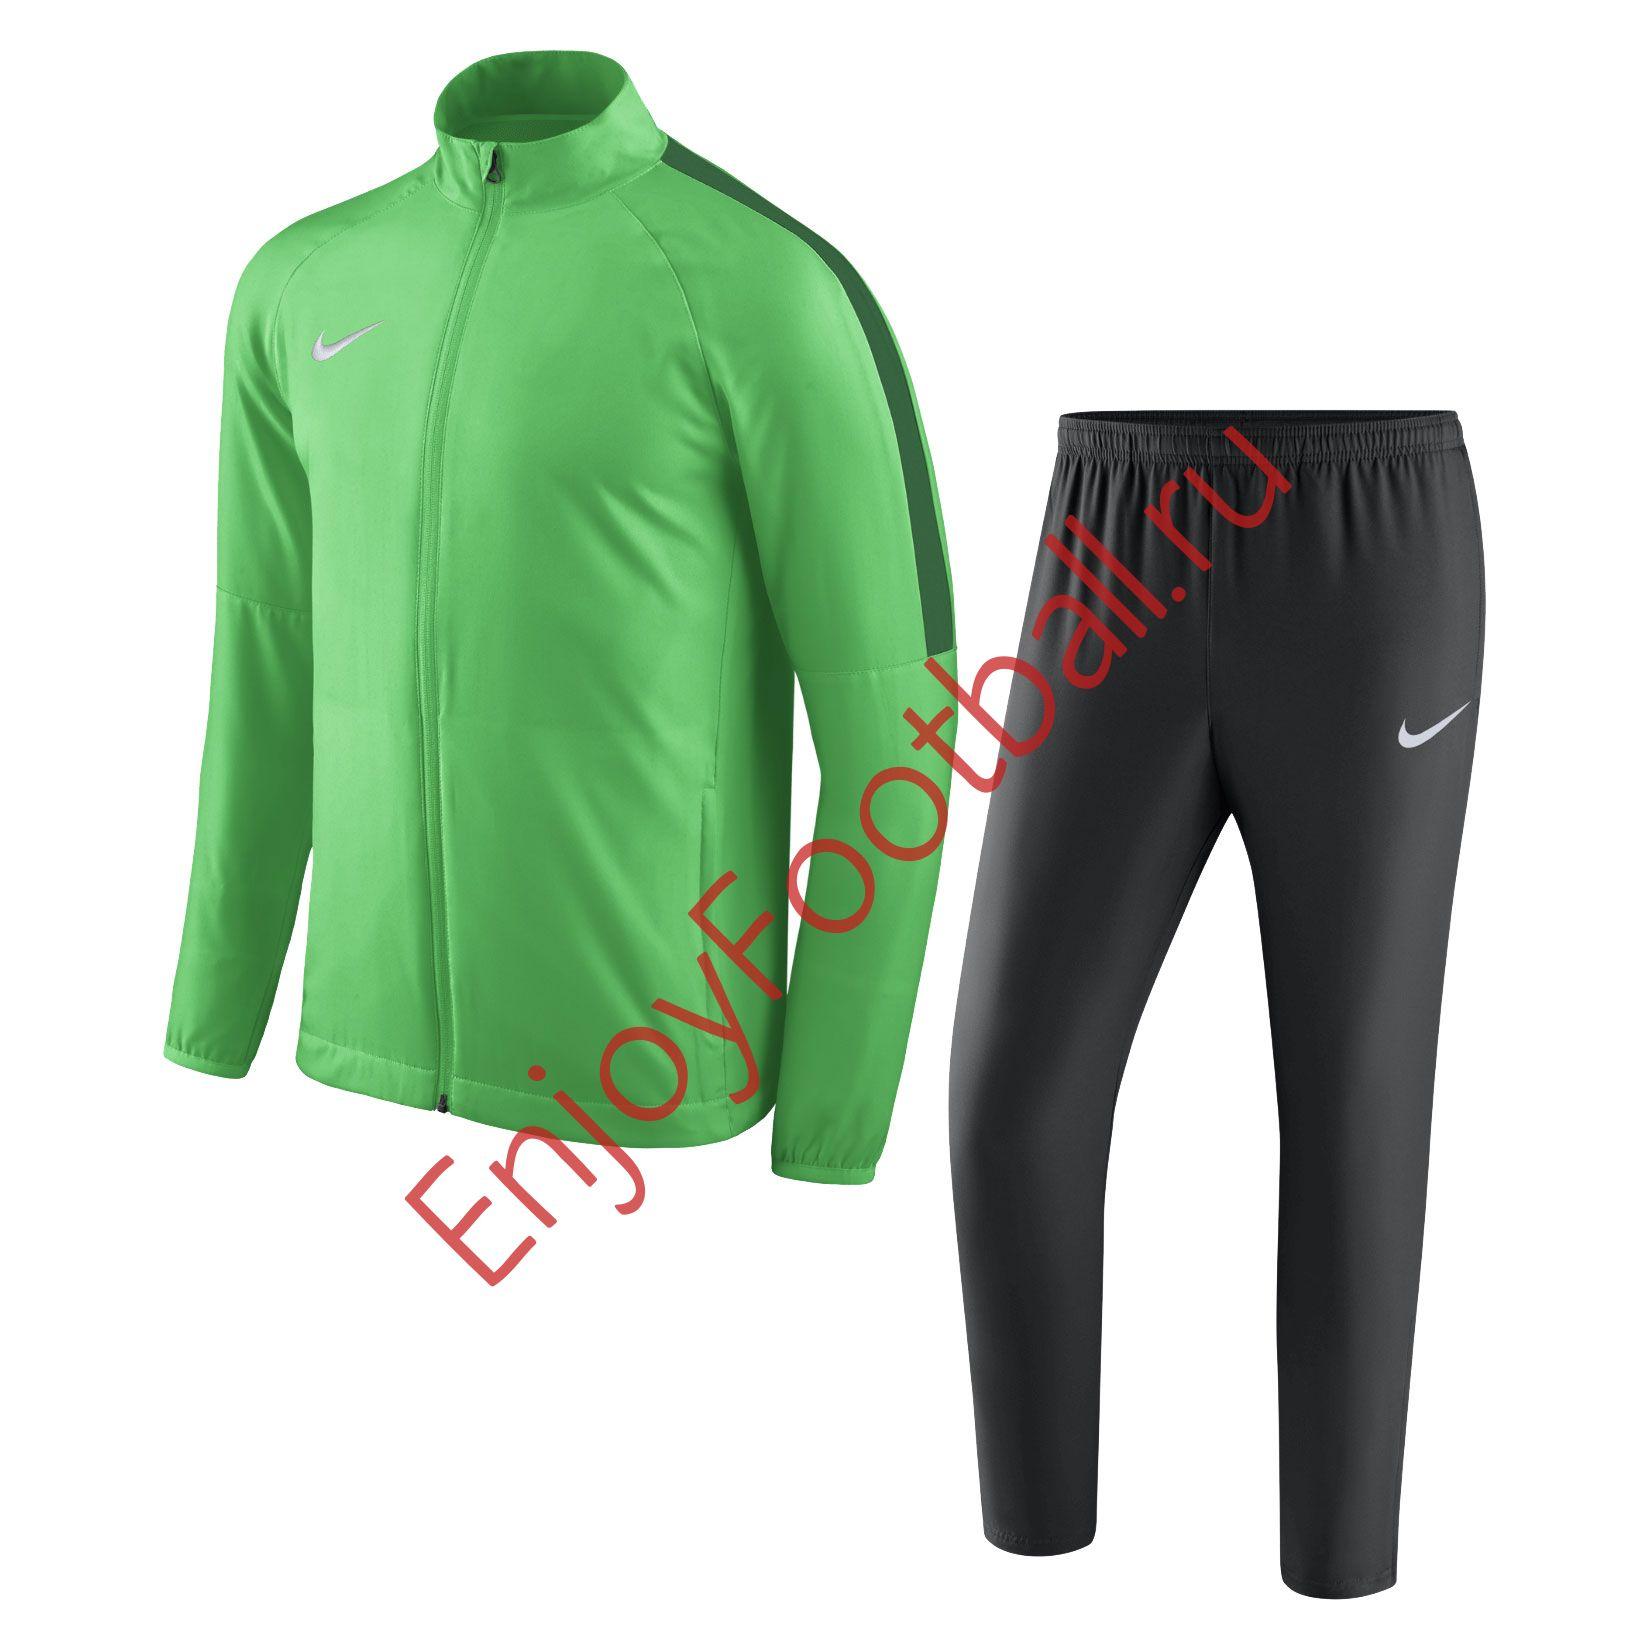 9bc84ade Спортивный костюм NIKE DRY ACDMY18 WOVEN TRK SUIT 893709-361 купить ...